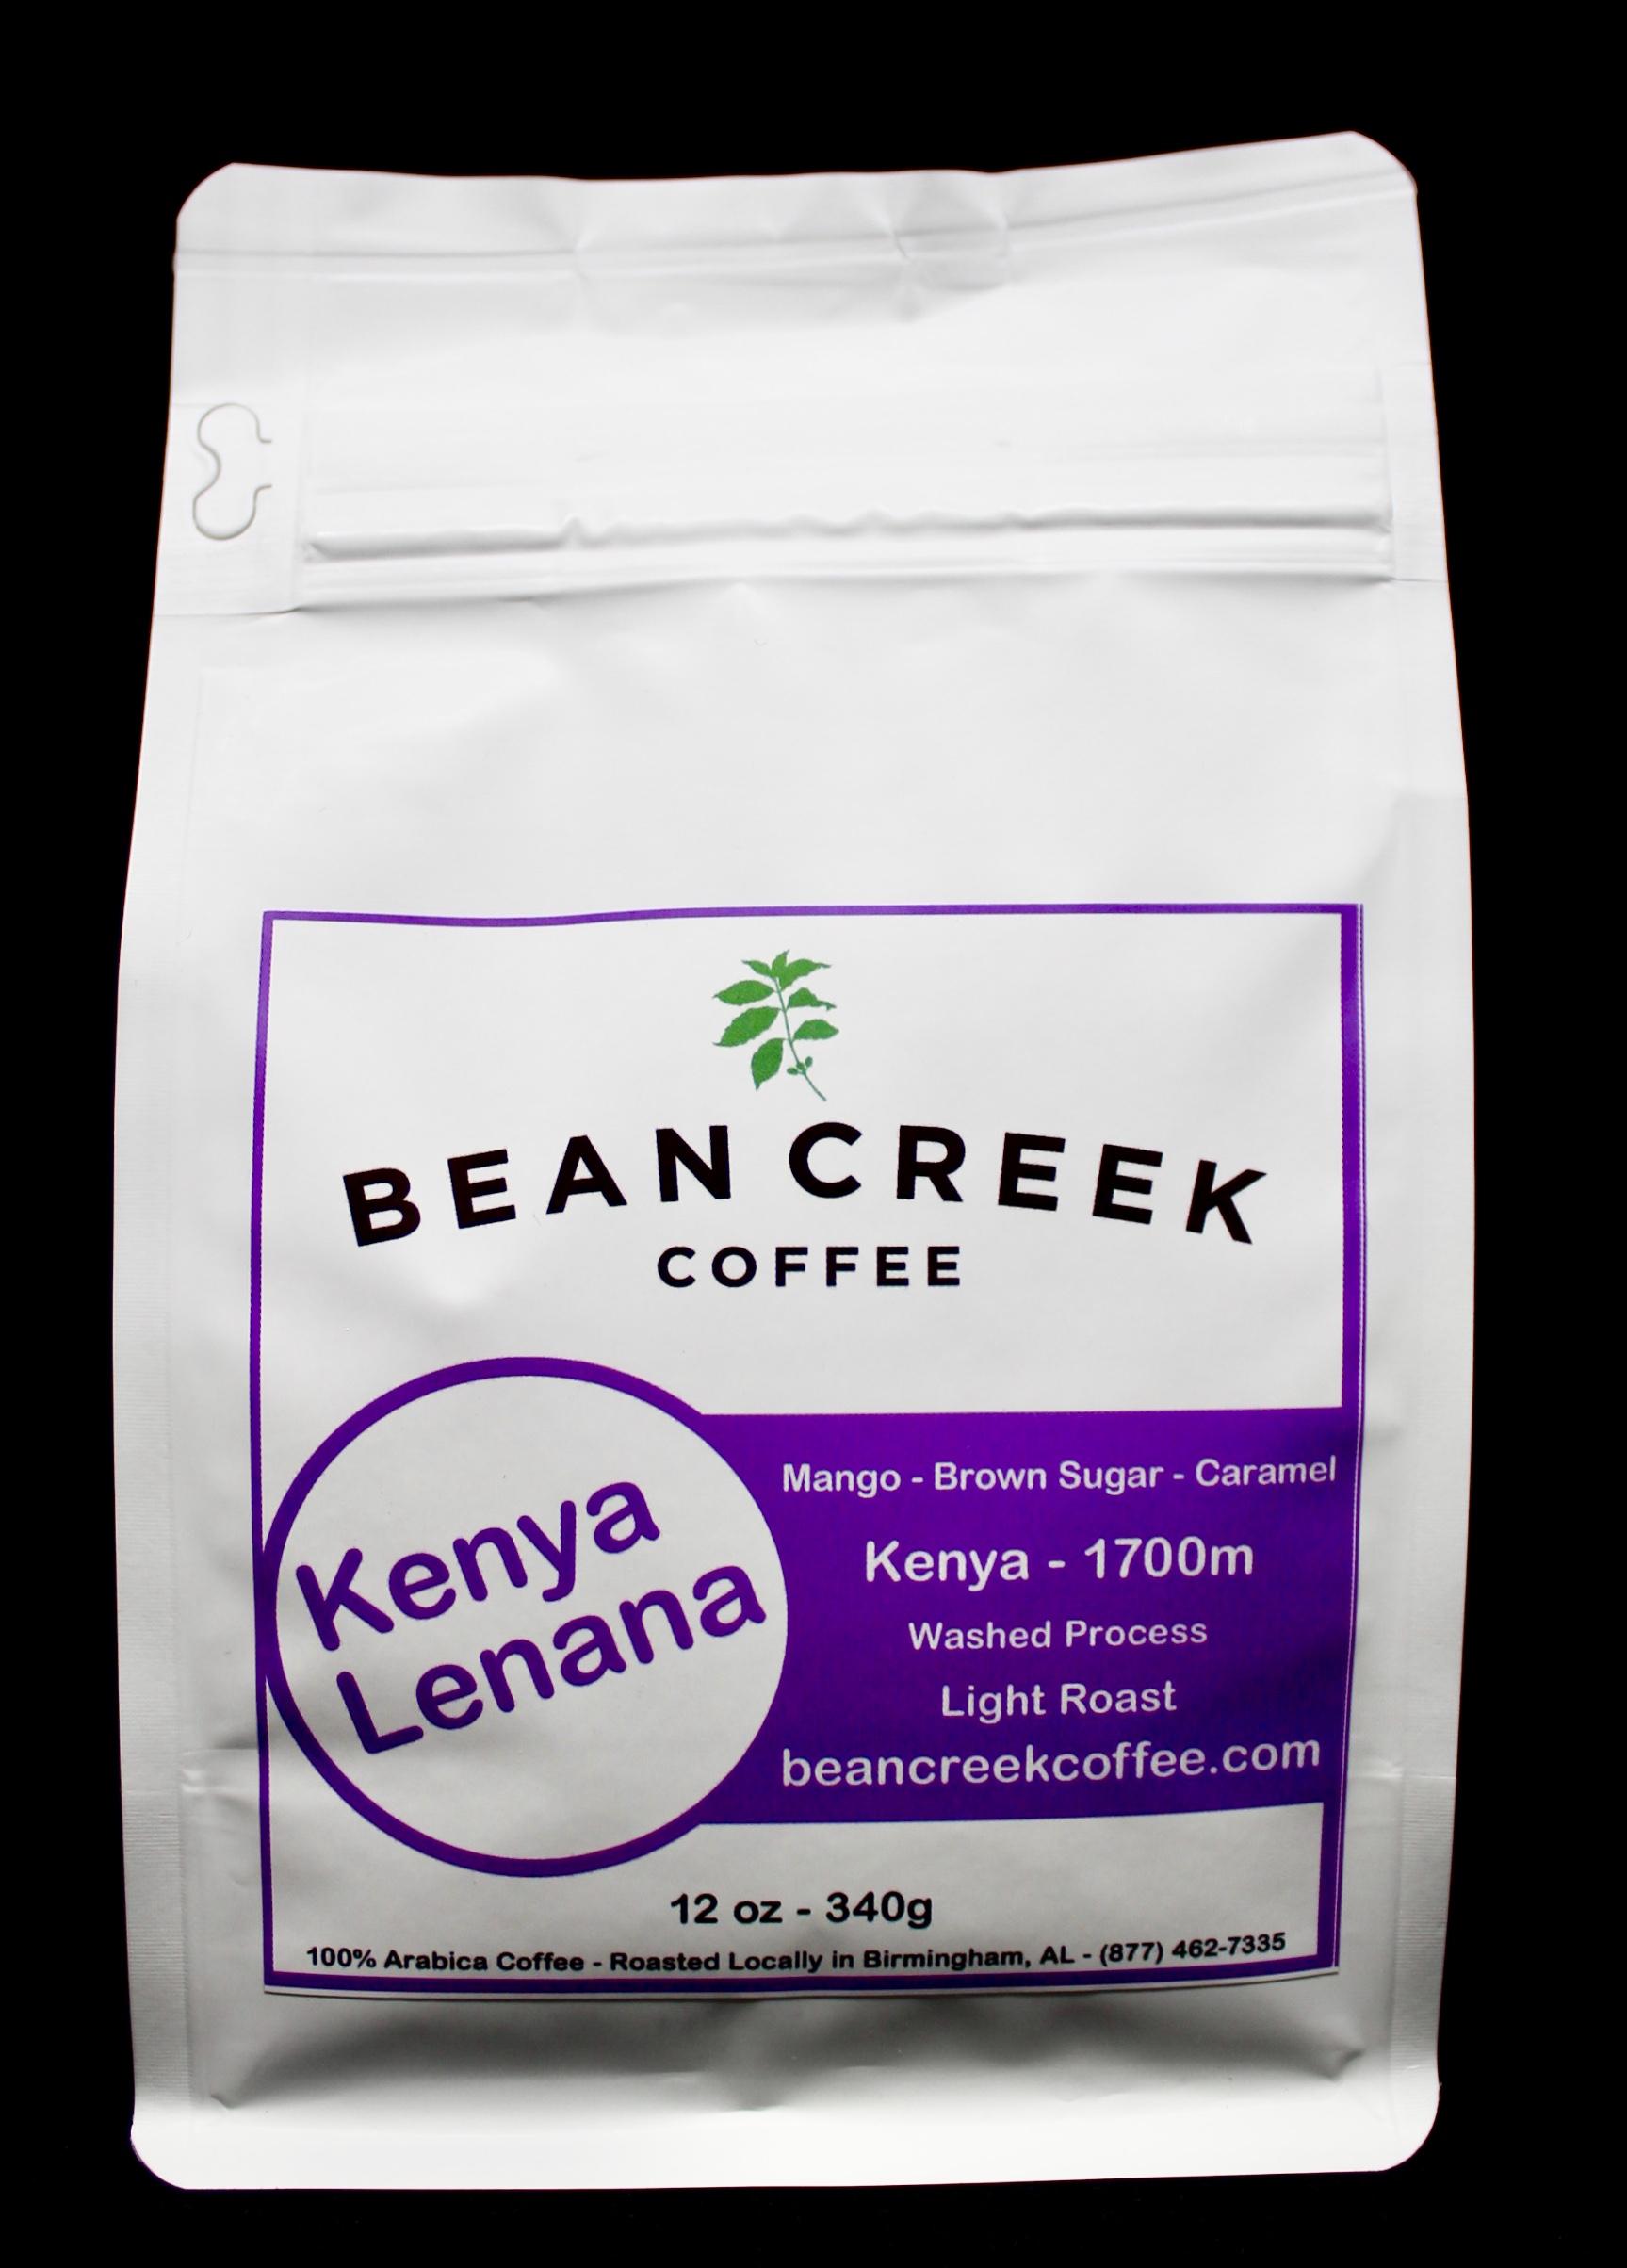 Bean Creek Kenya Lenana single-origin coffee